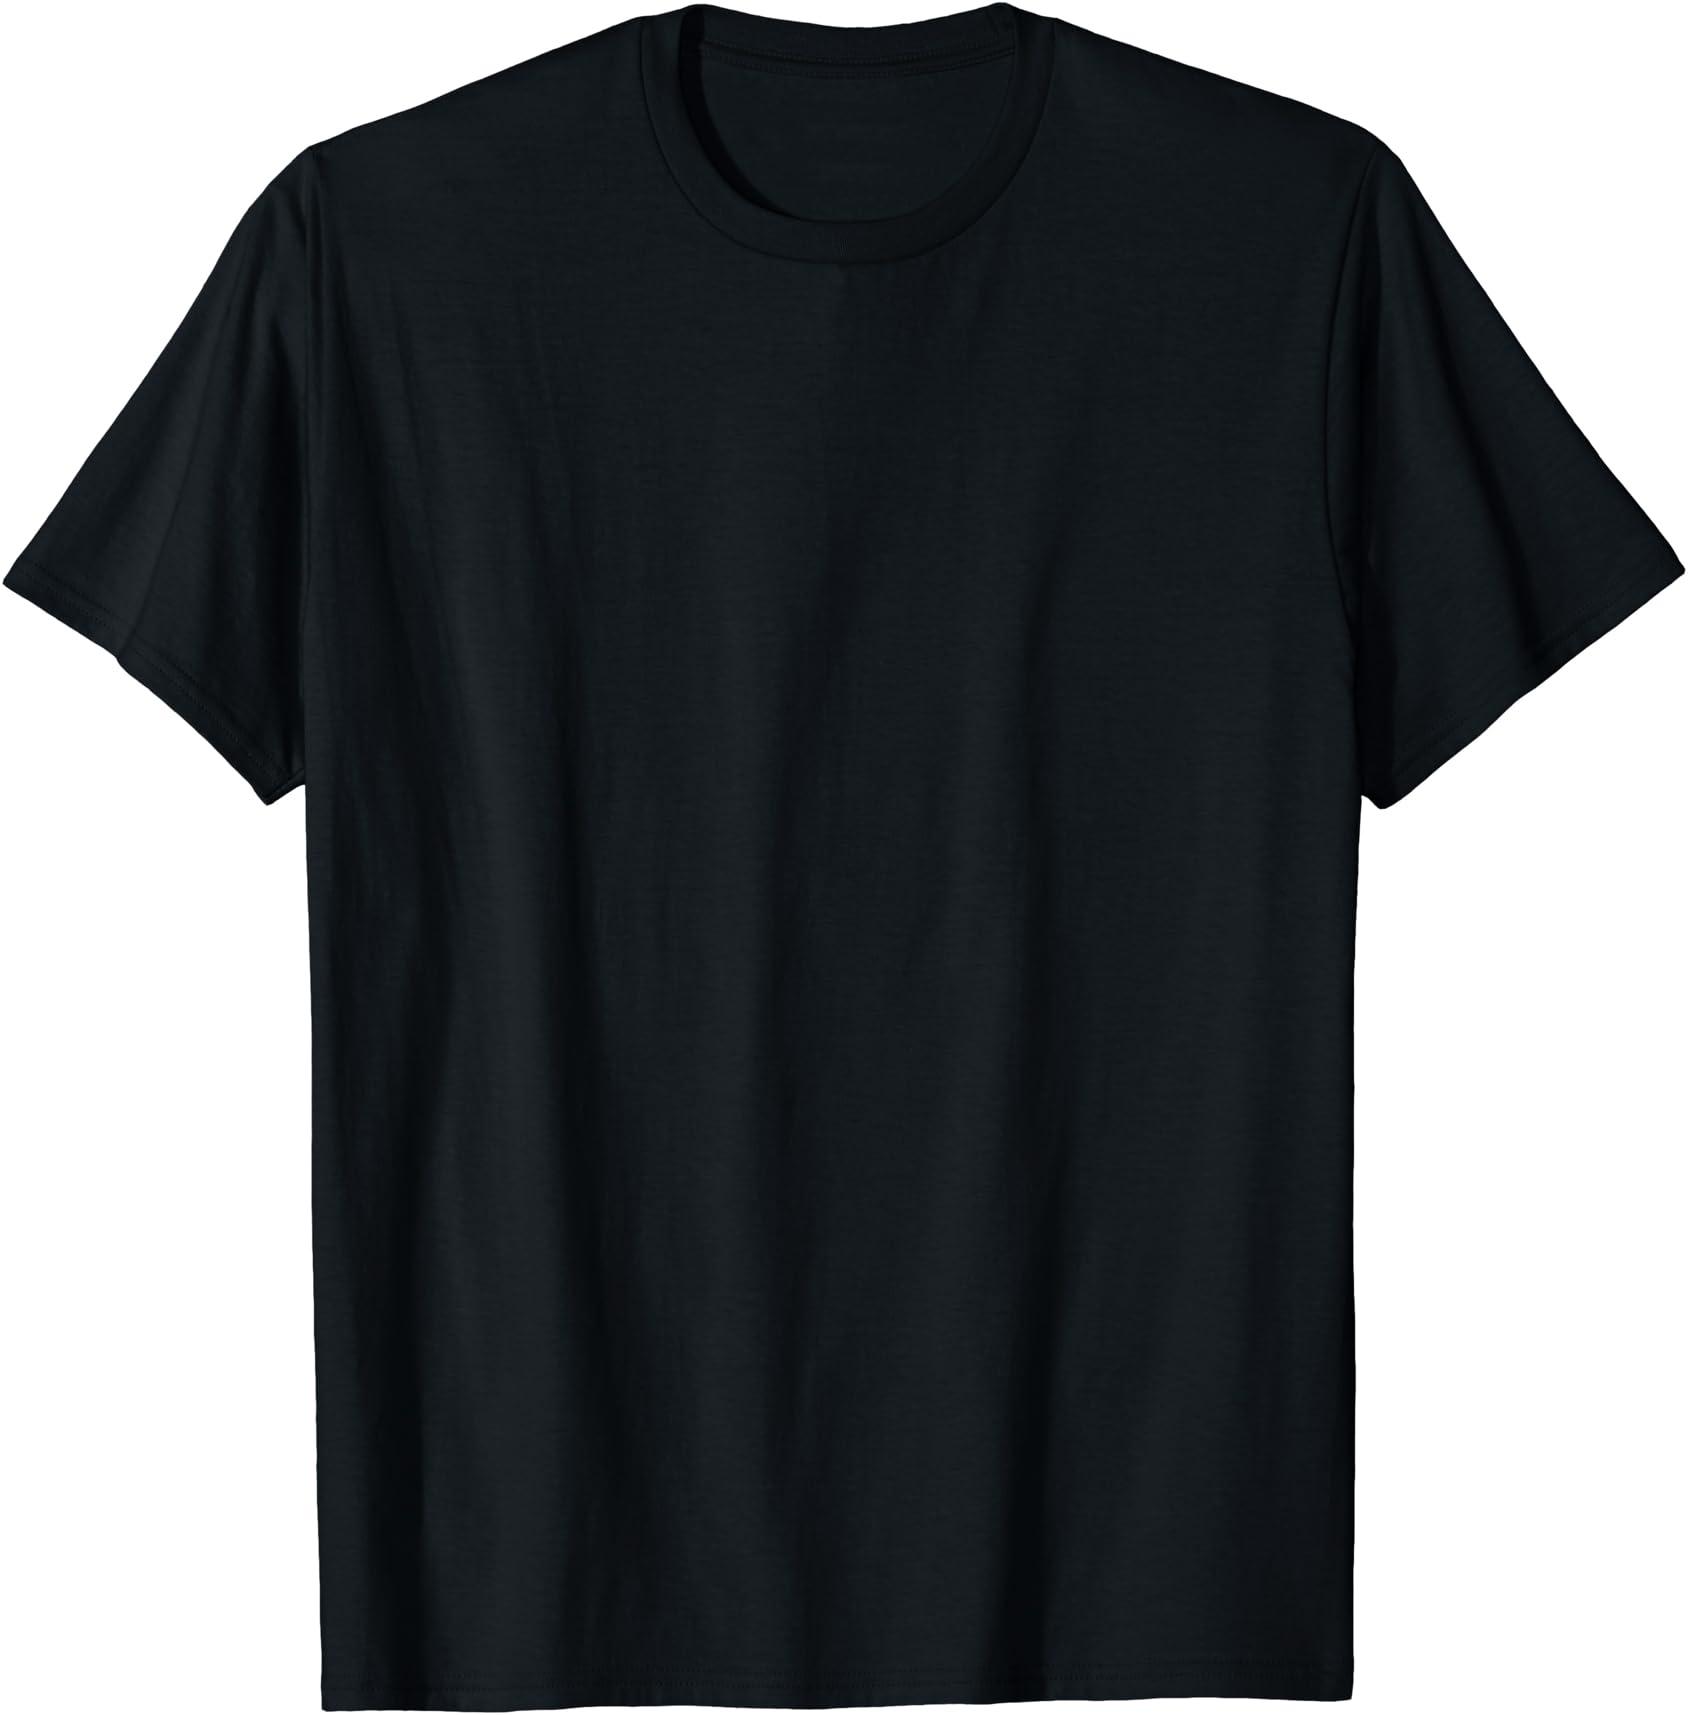 Funny Kids Childrens T-Shirt tee TShirt Cat Enthusiast